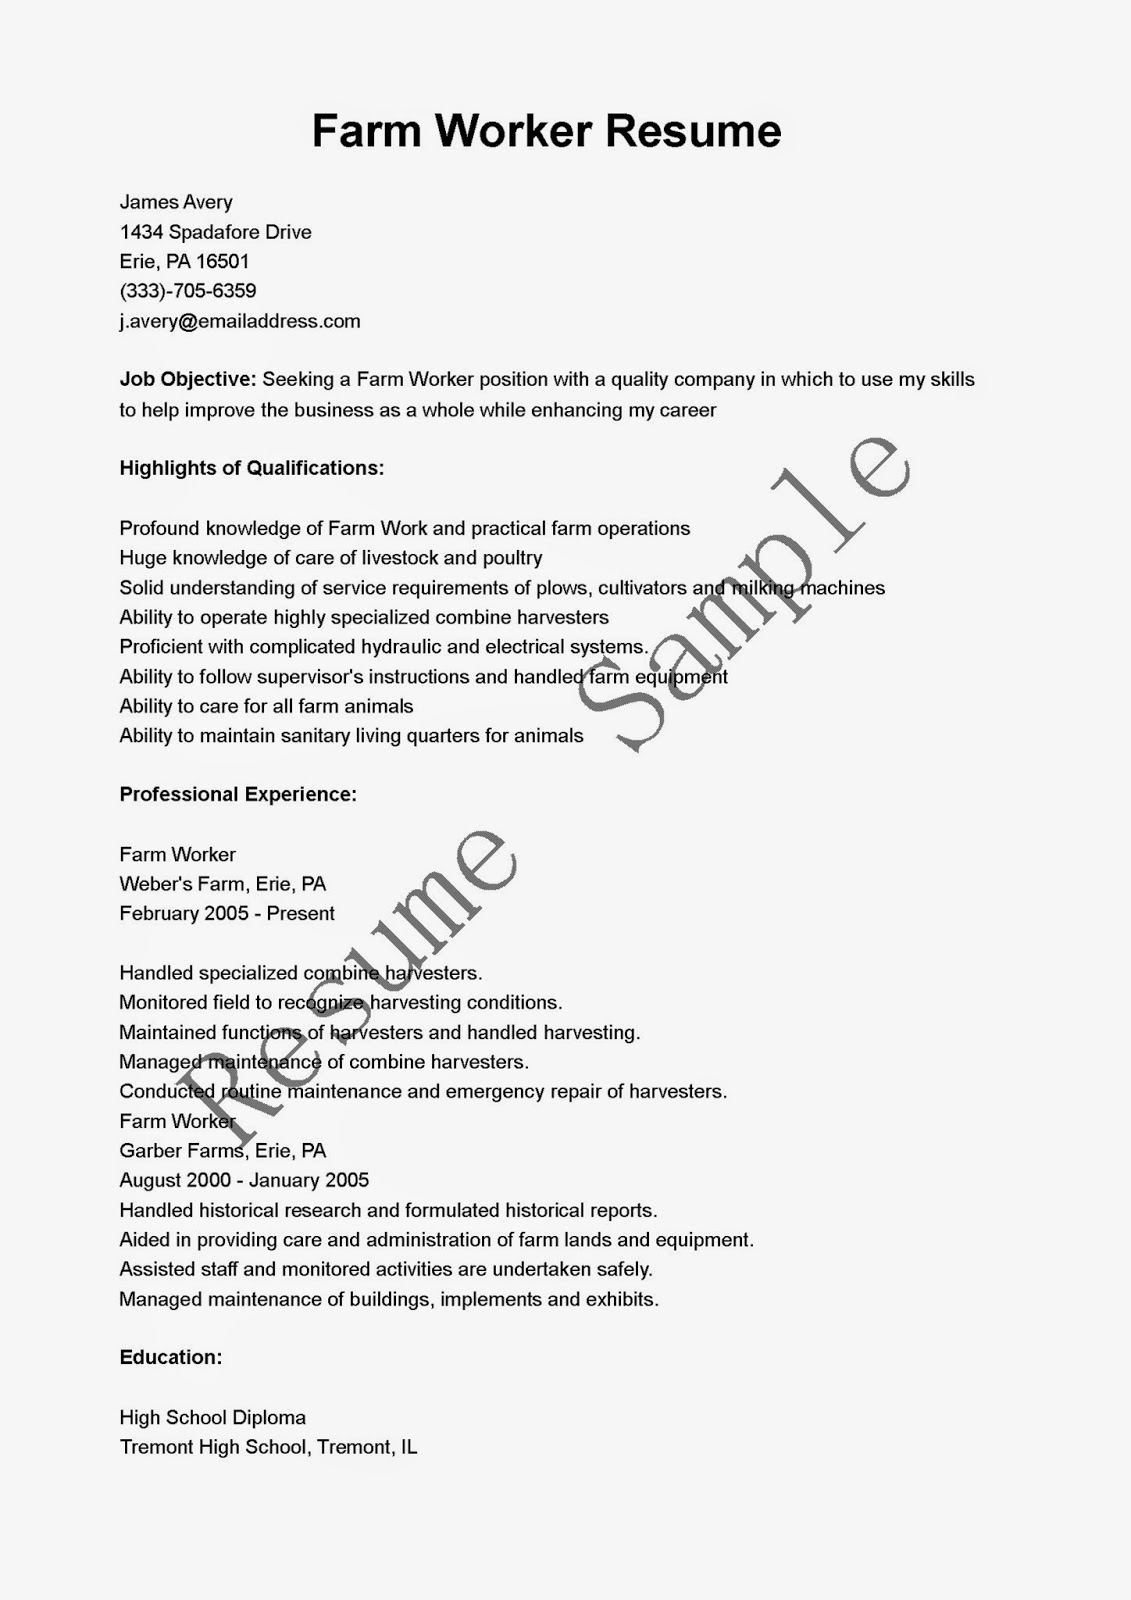 Resume Samples Farm Worker Resume Sample